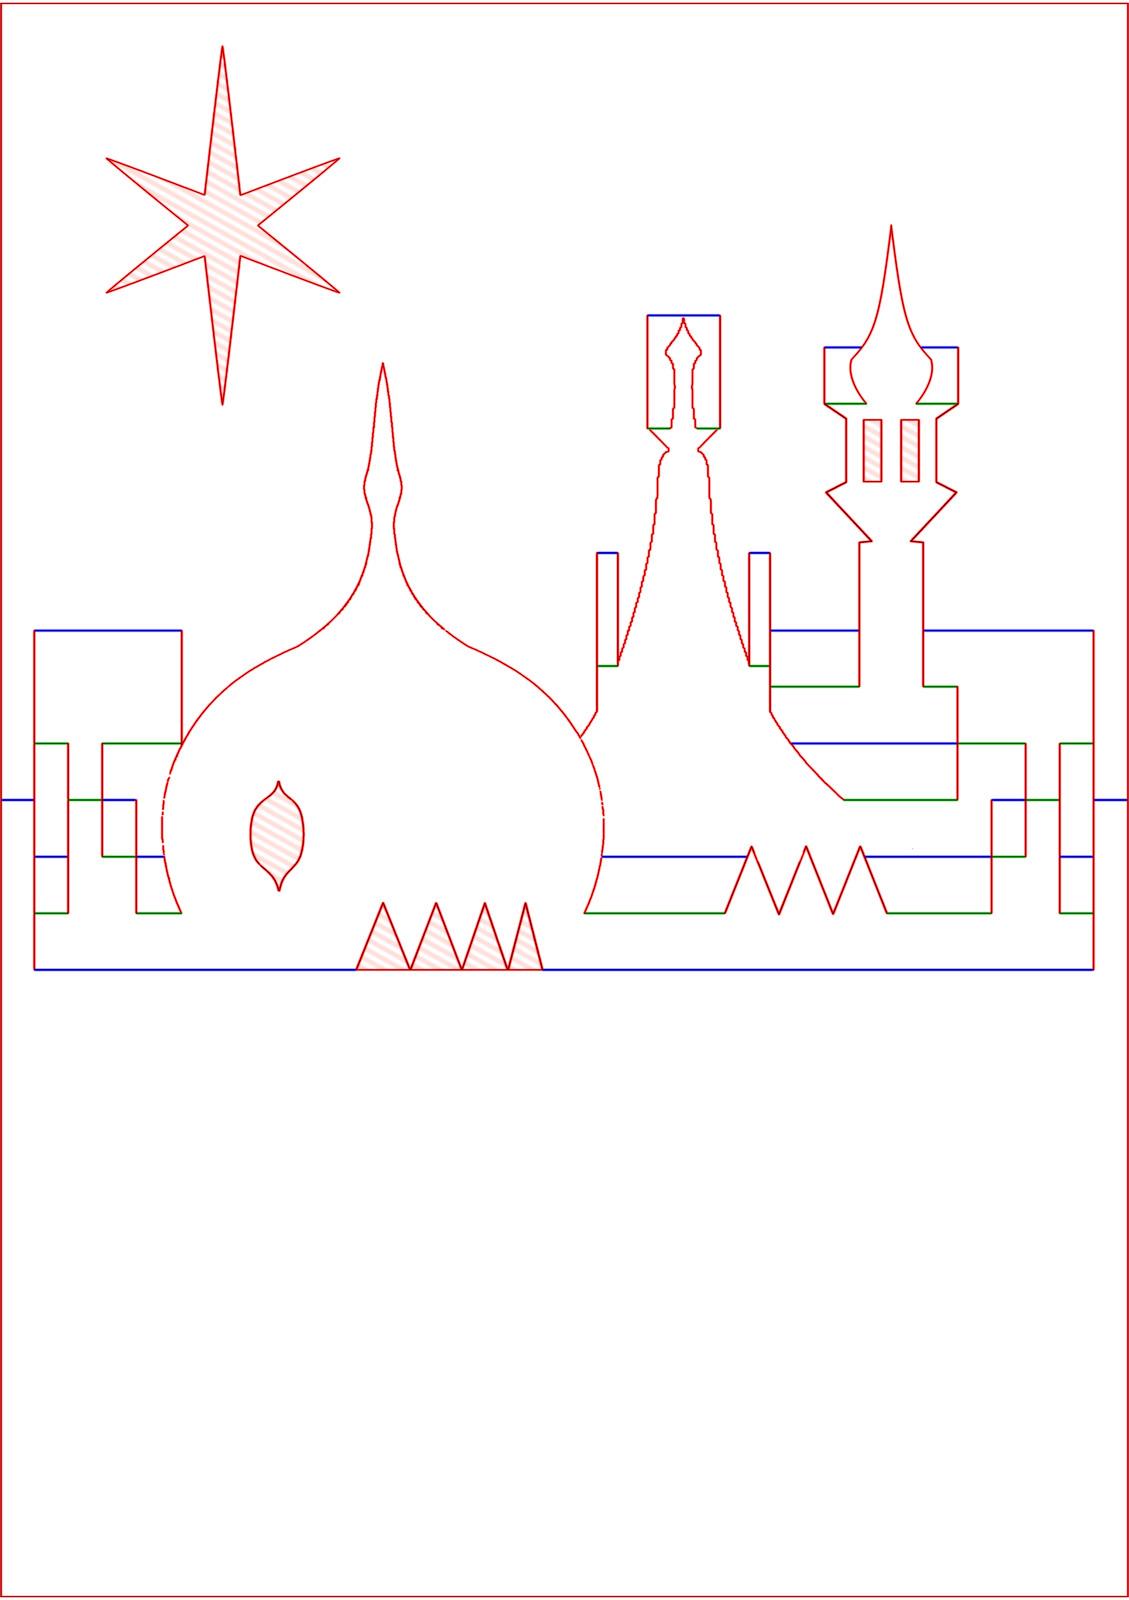 hight resolution of kirigami diagram pop up card prince regent royal brighton pavilion rooftop skyline